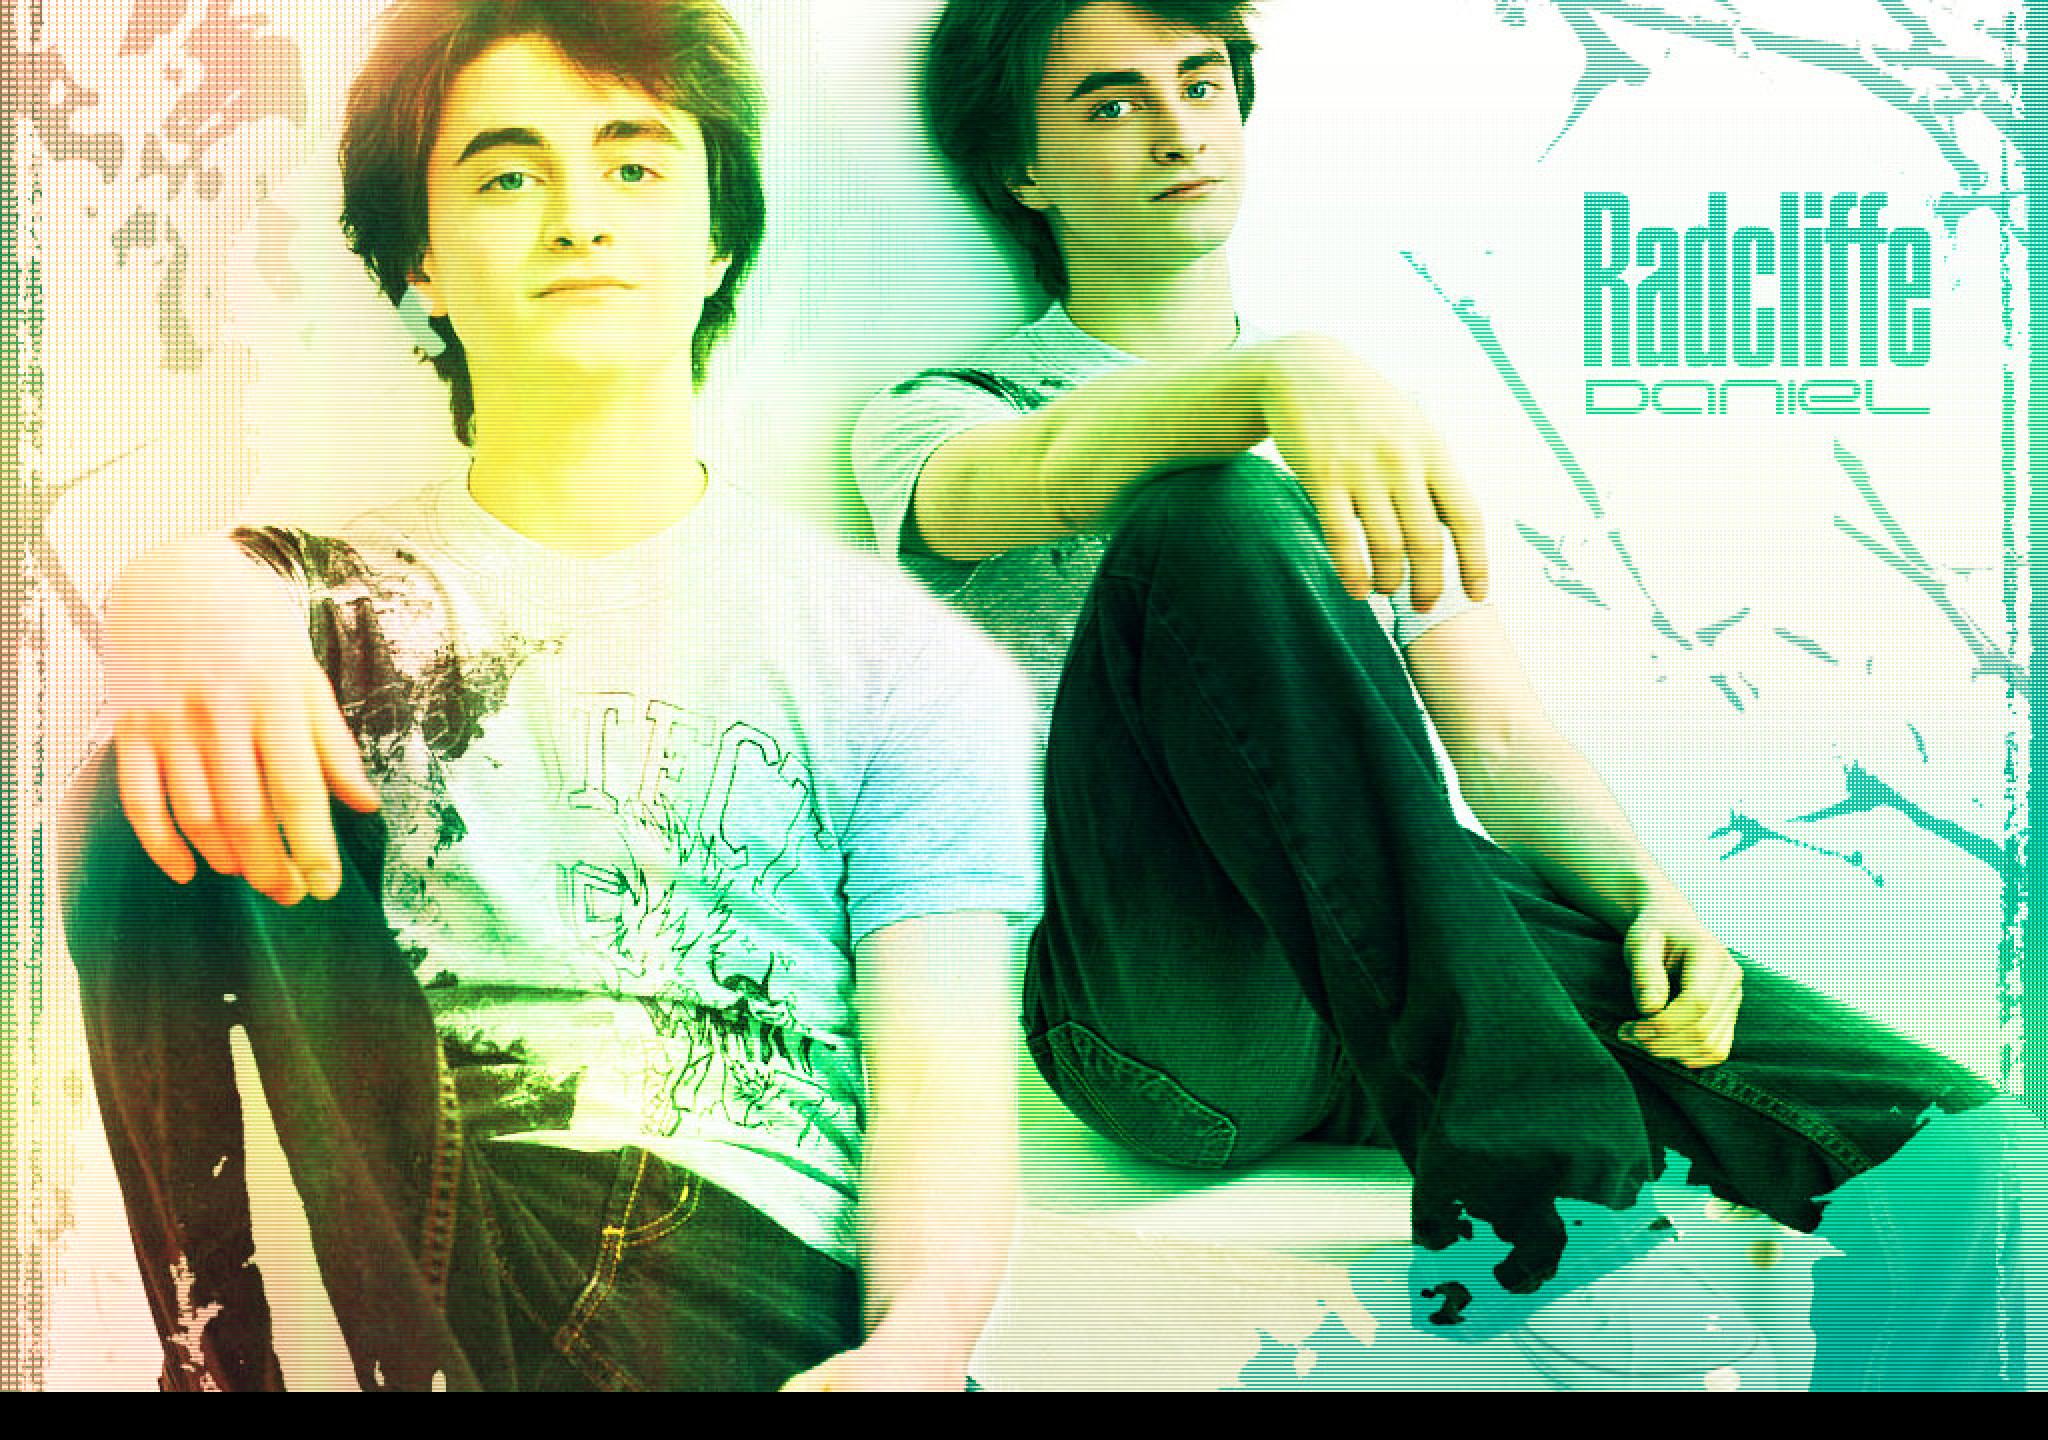 daniel radcliffe--c2048xc1440 jpg Daniel Radcliffe